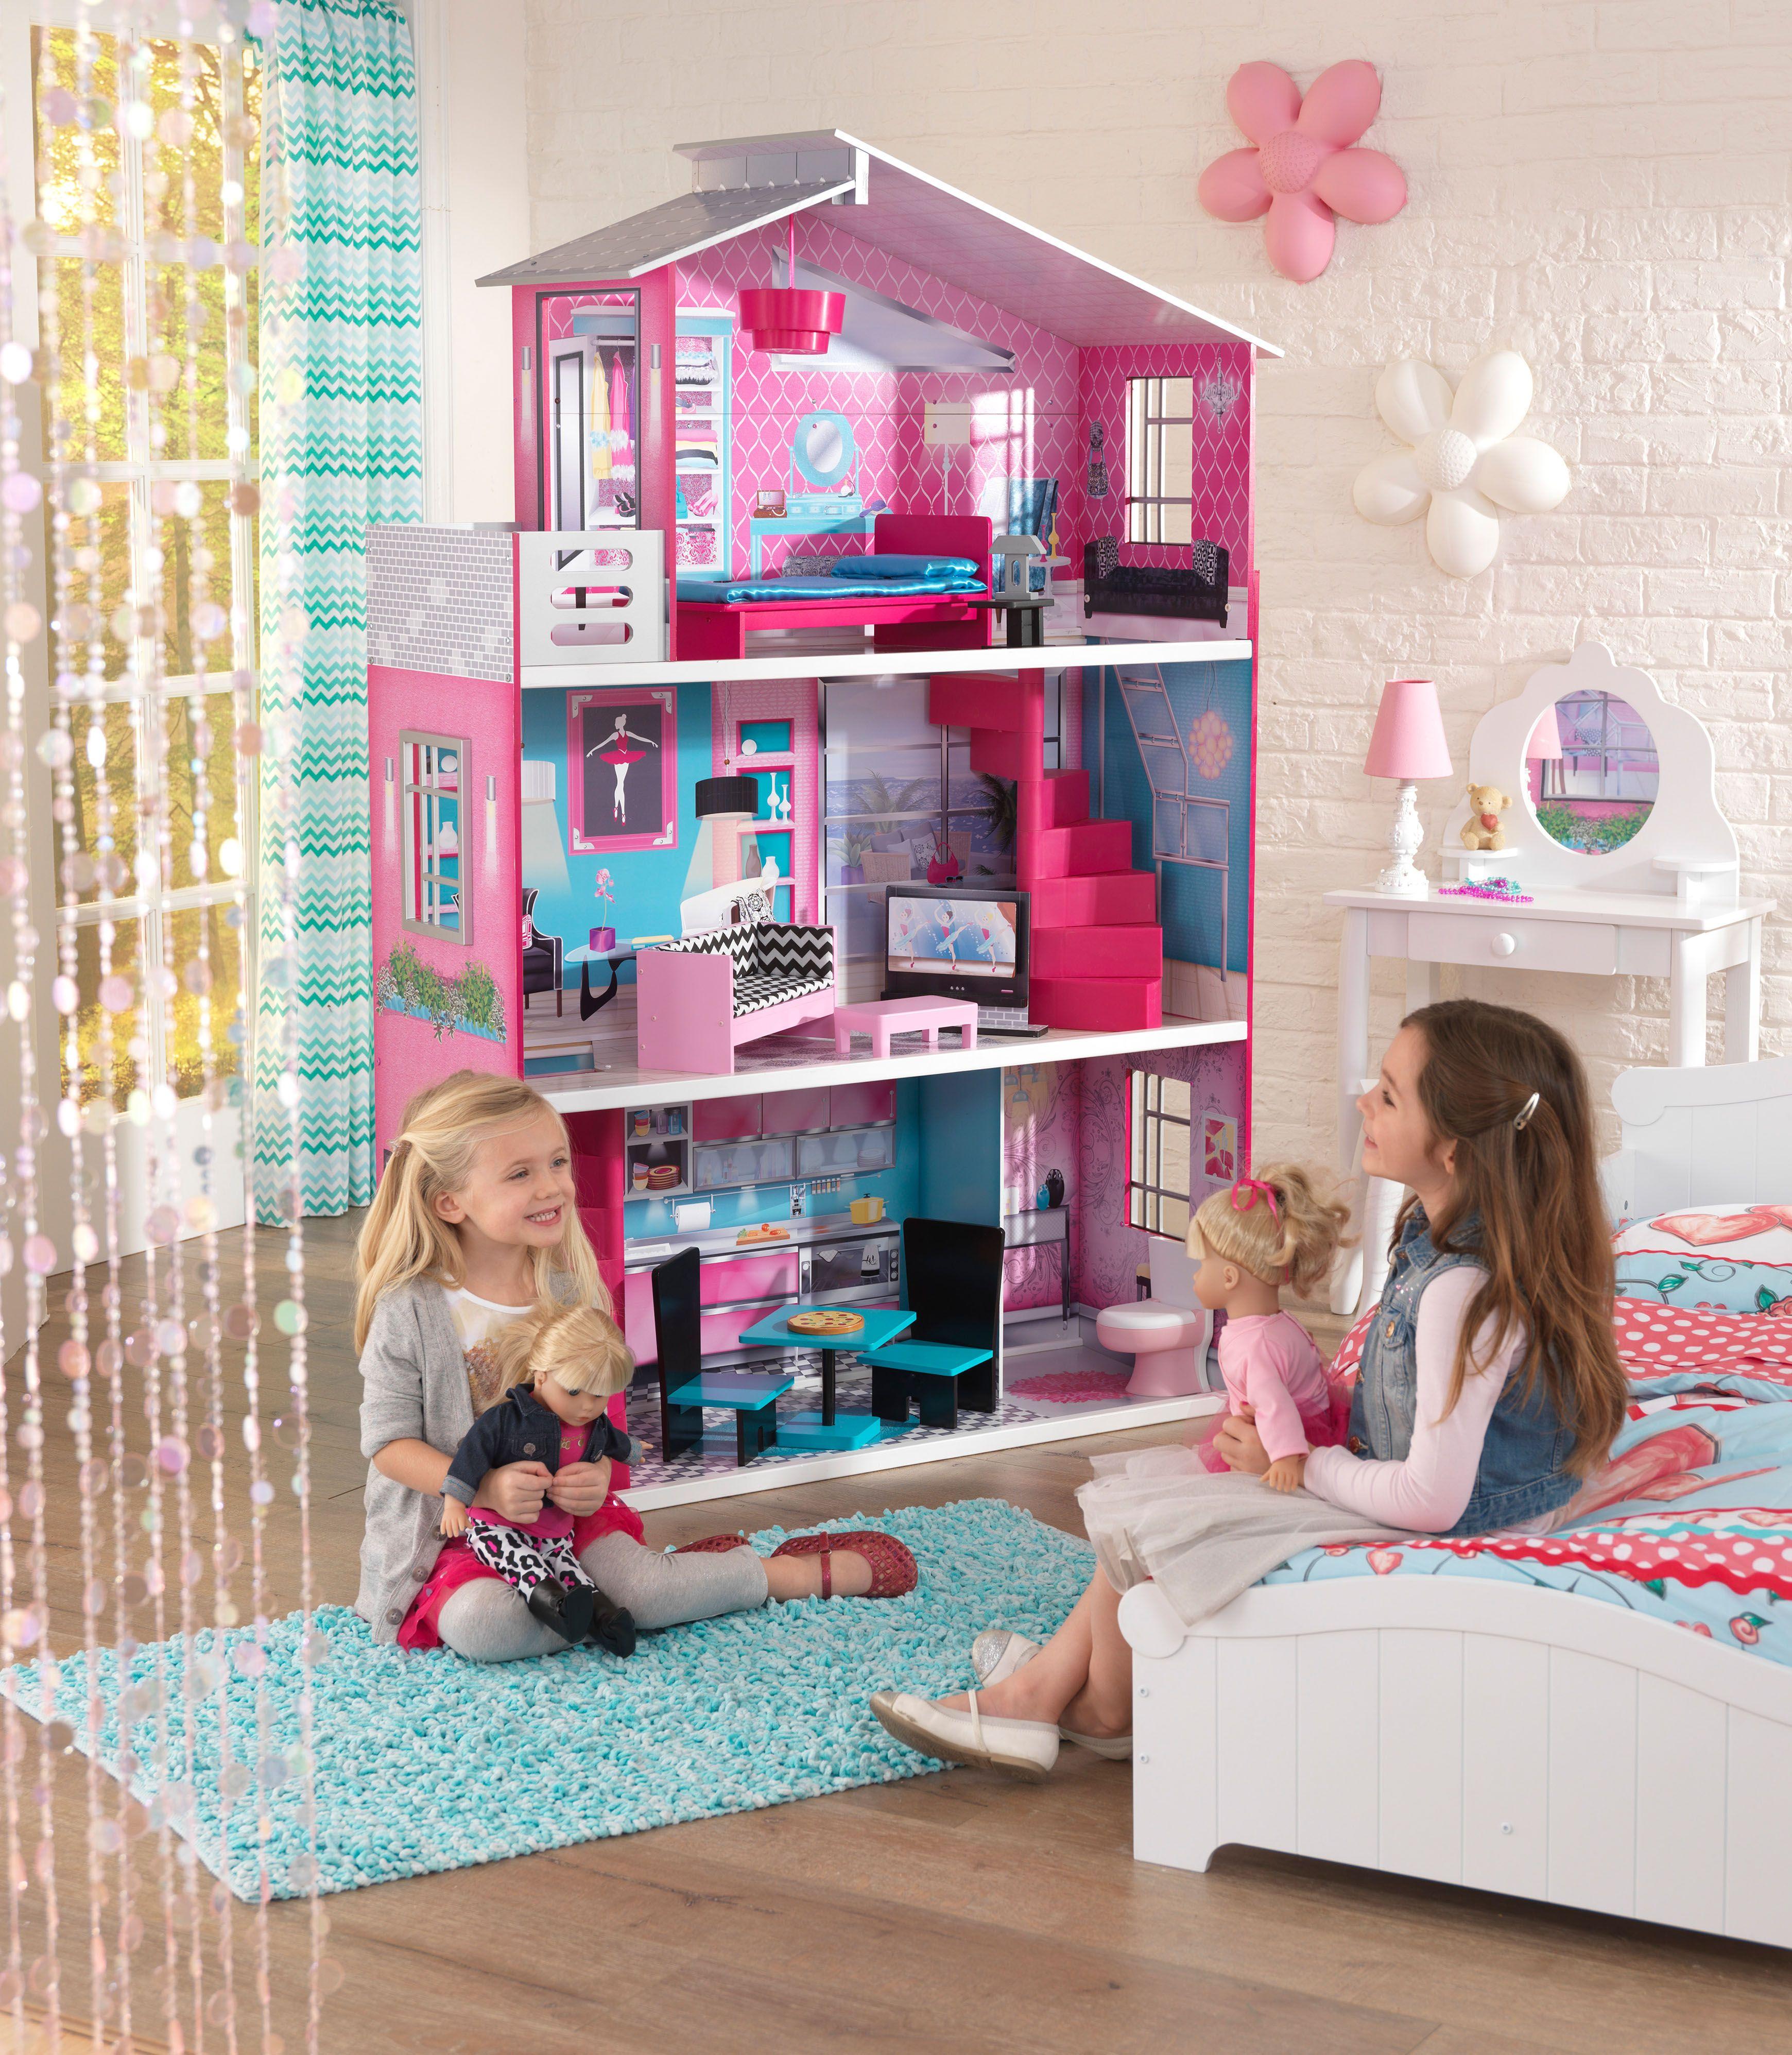 inexpensive dollhouse furniture. Find This Pin And More On Discount Dollhouse. Inexpensive Dollhouse Furniture U